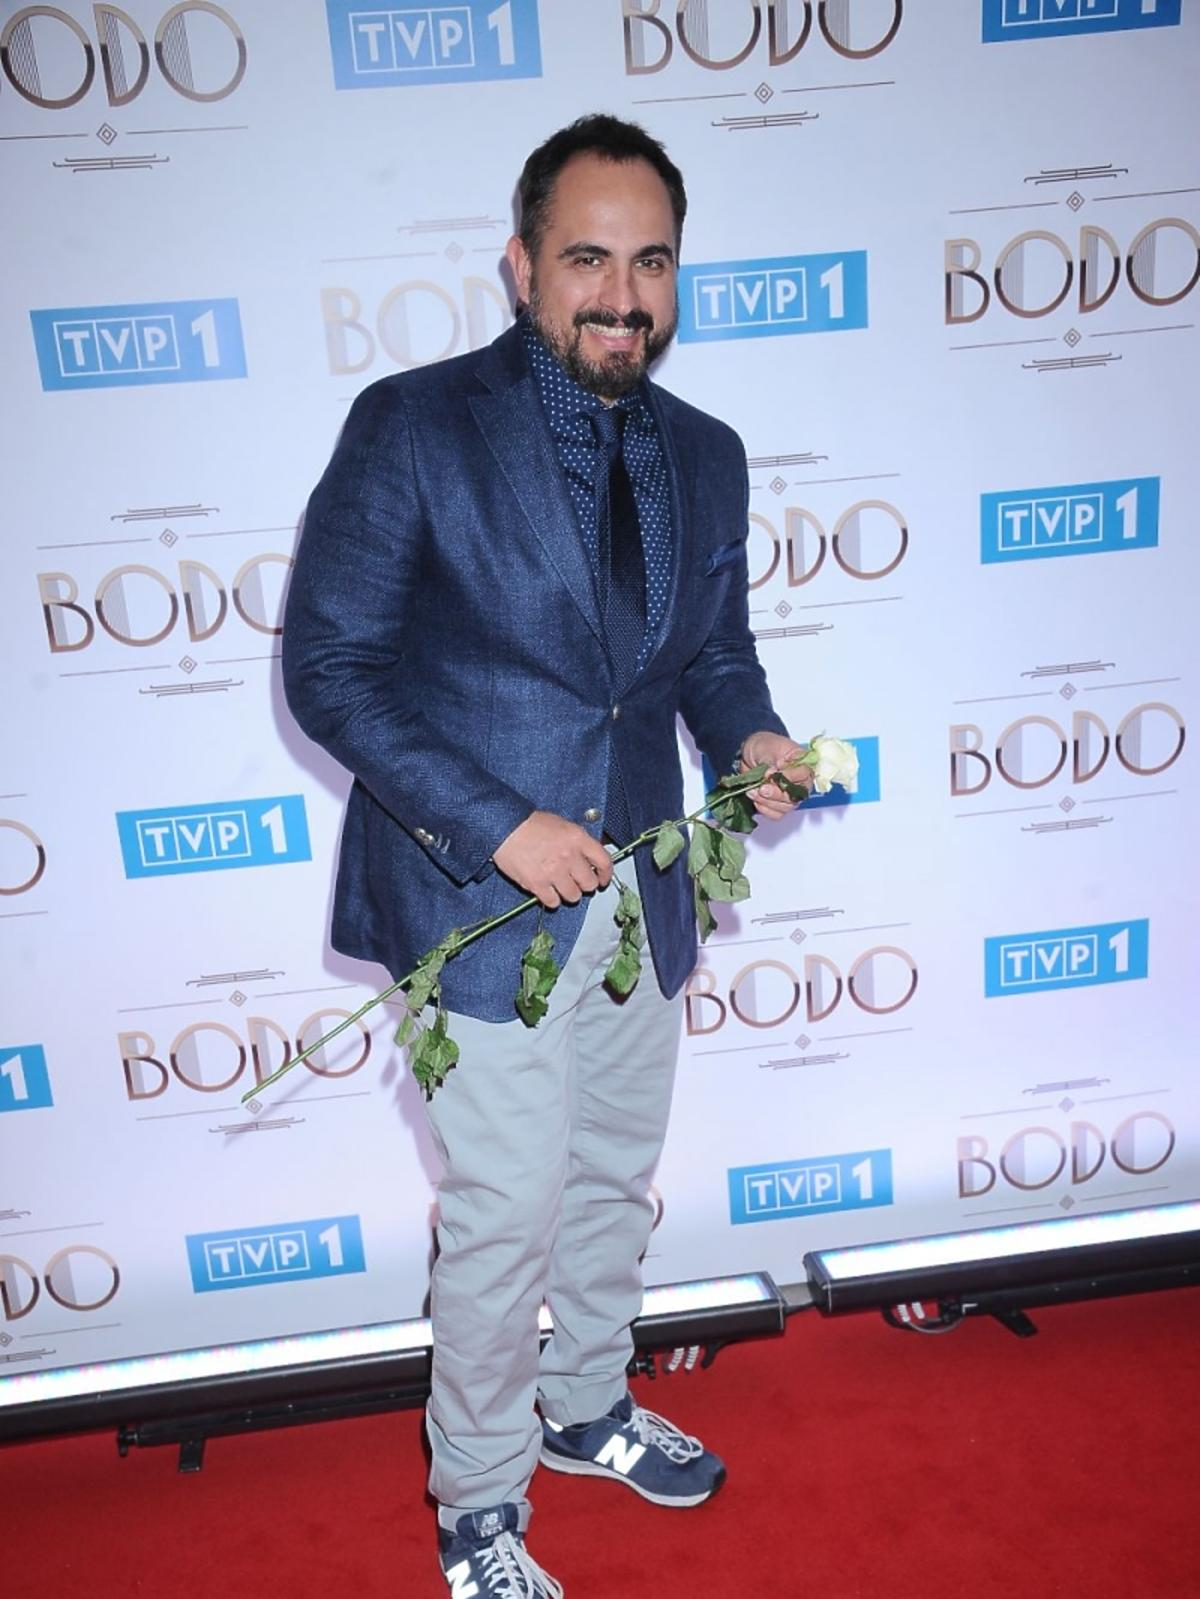 Agustin Egruolla na premierze Bodo